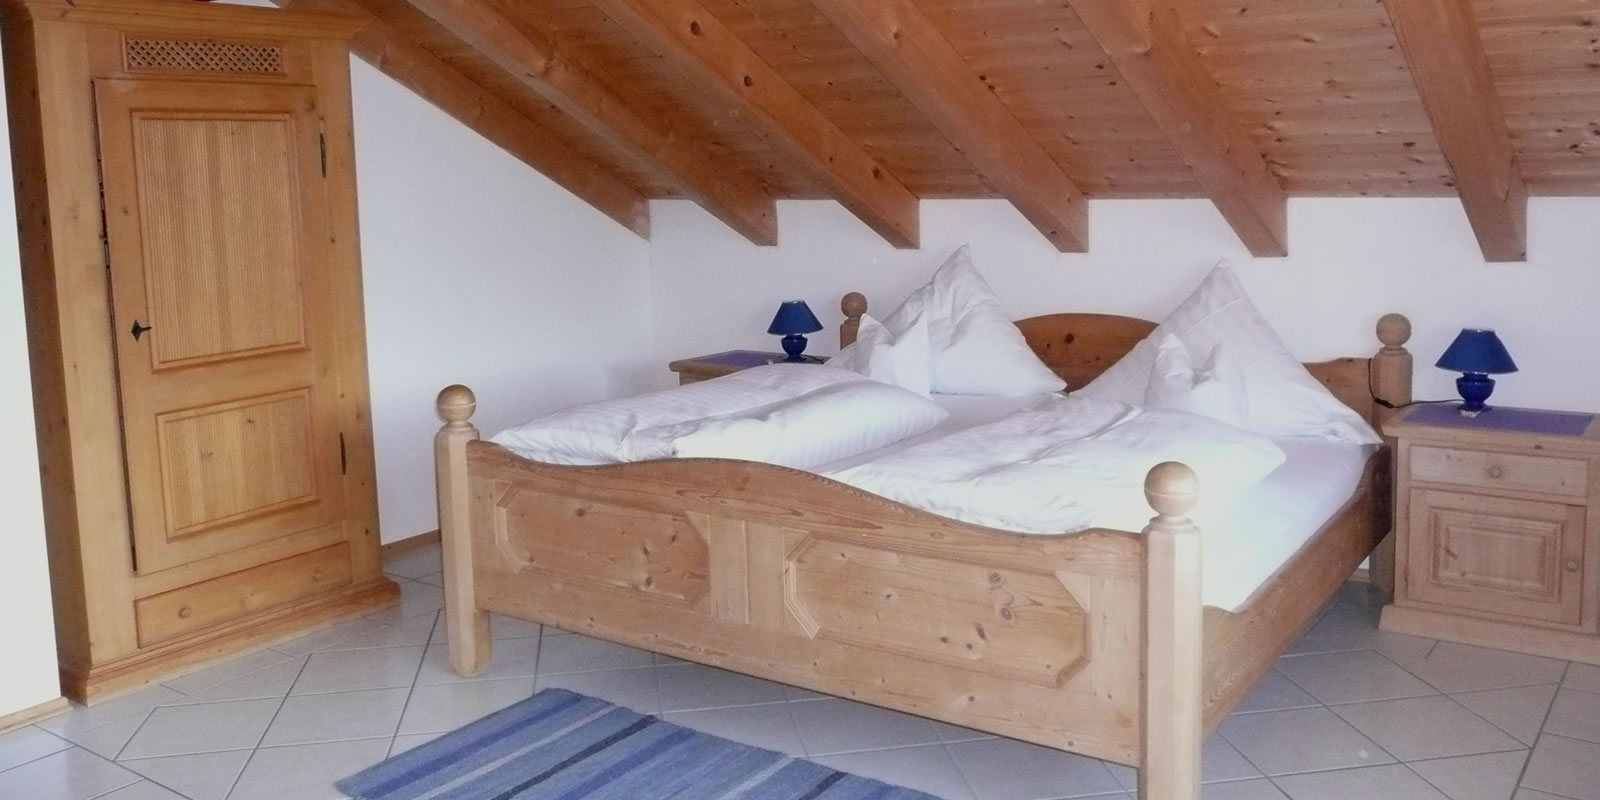 Landhaus Bad hotel bad heilbrunn landhaus caesar jetzt anfragen